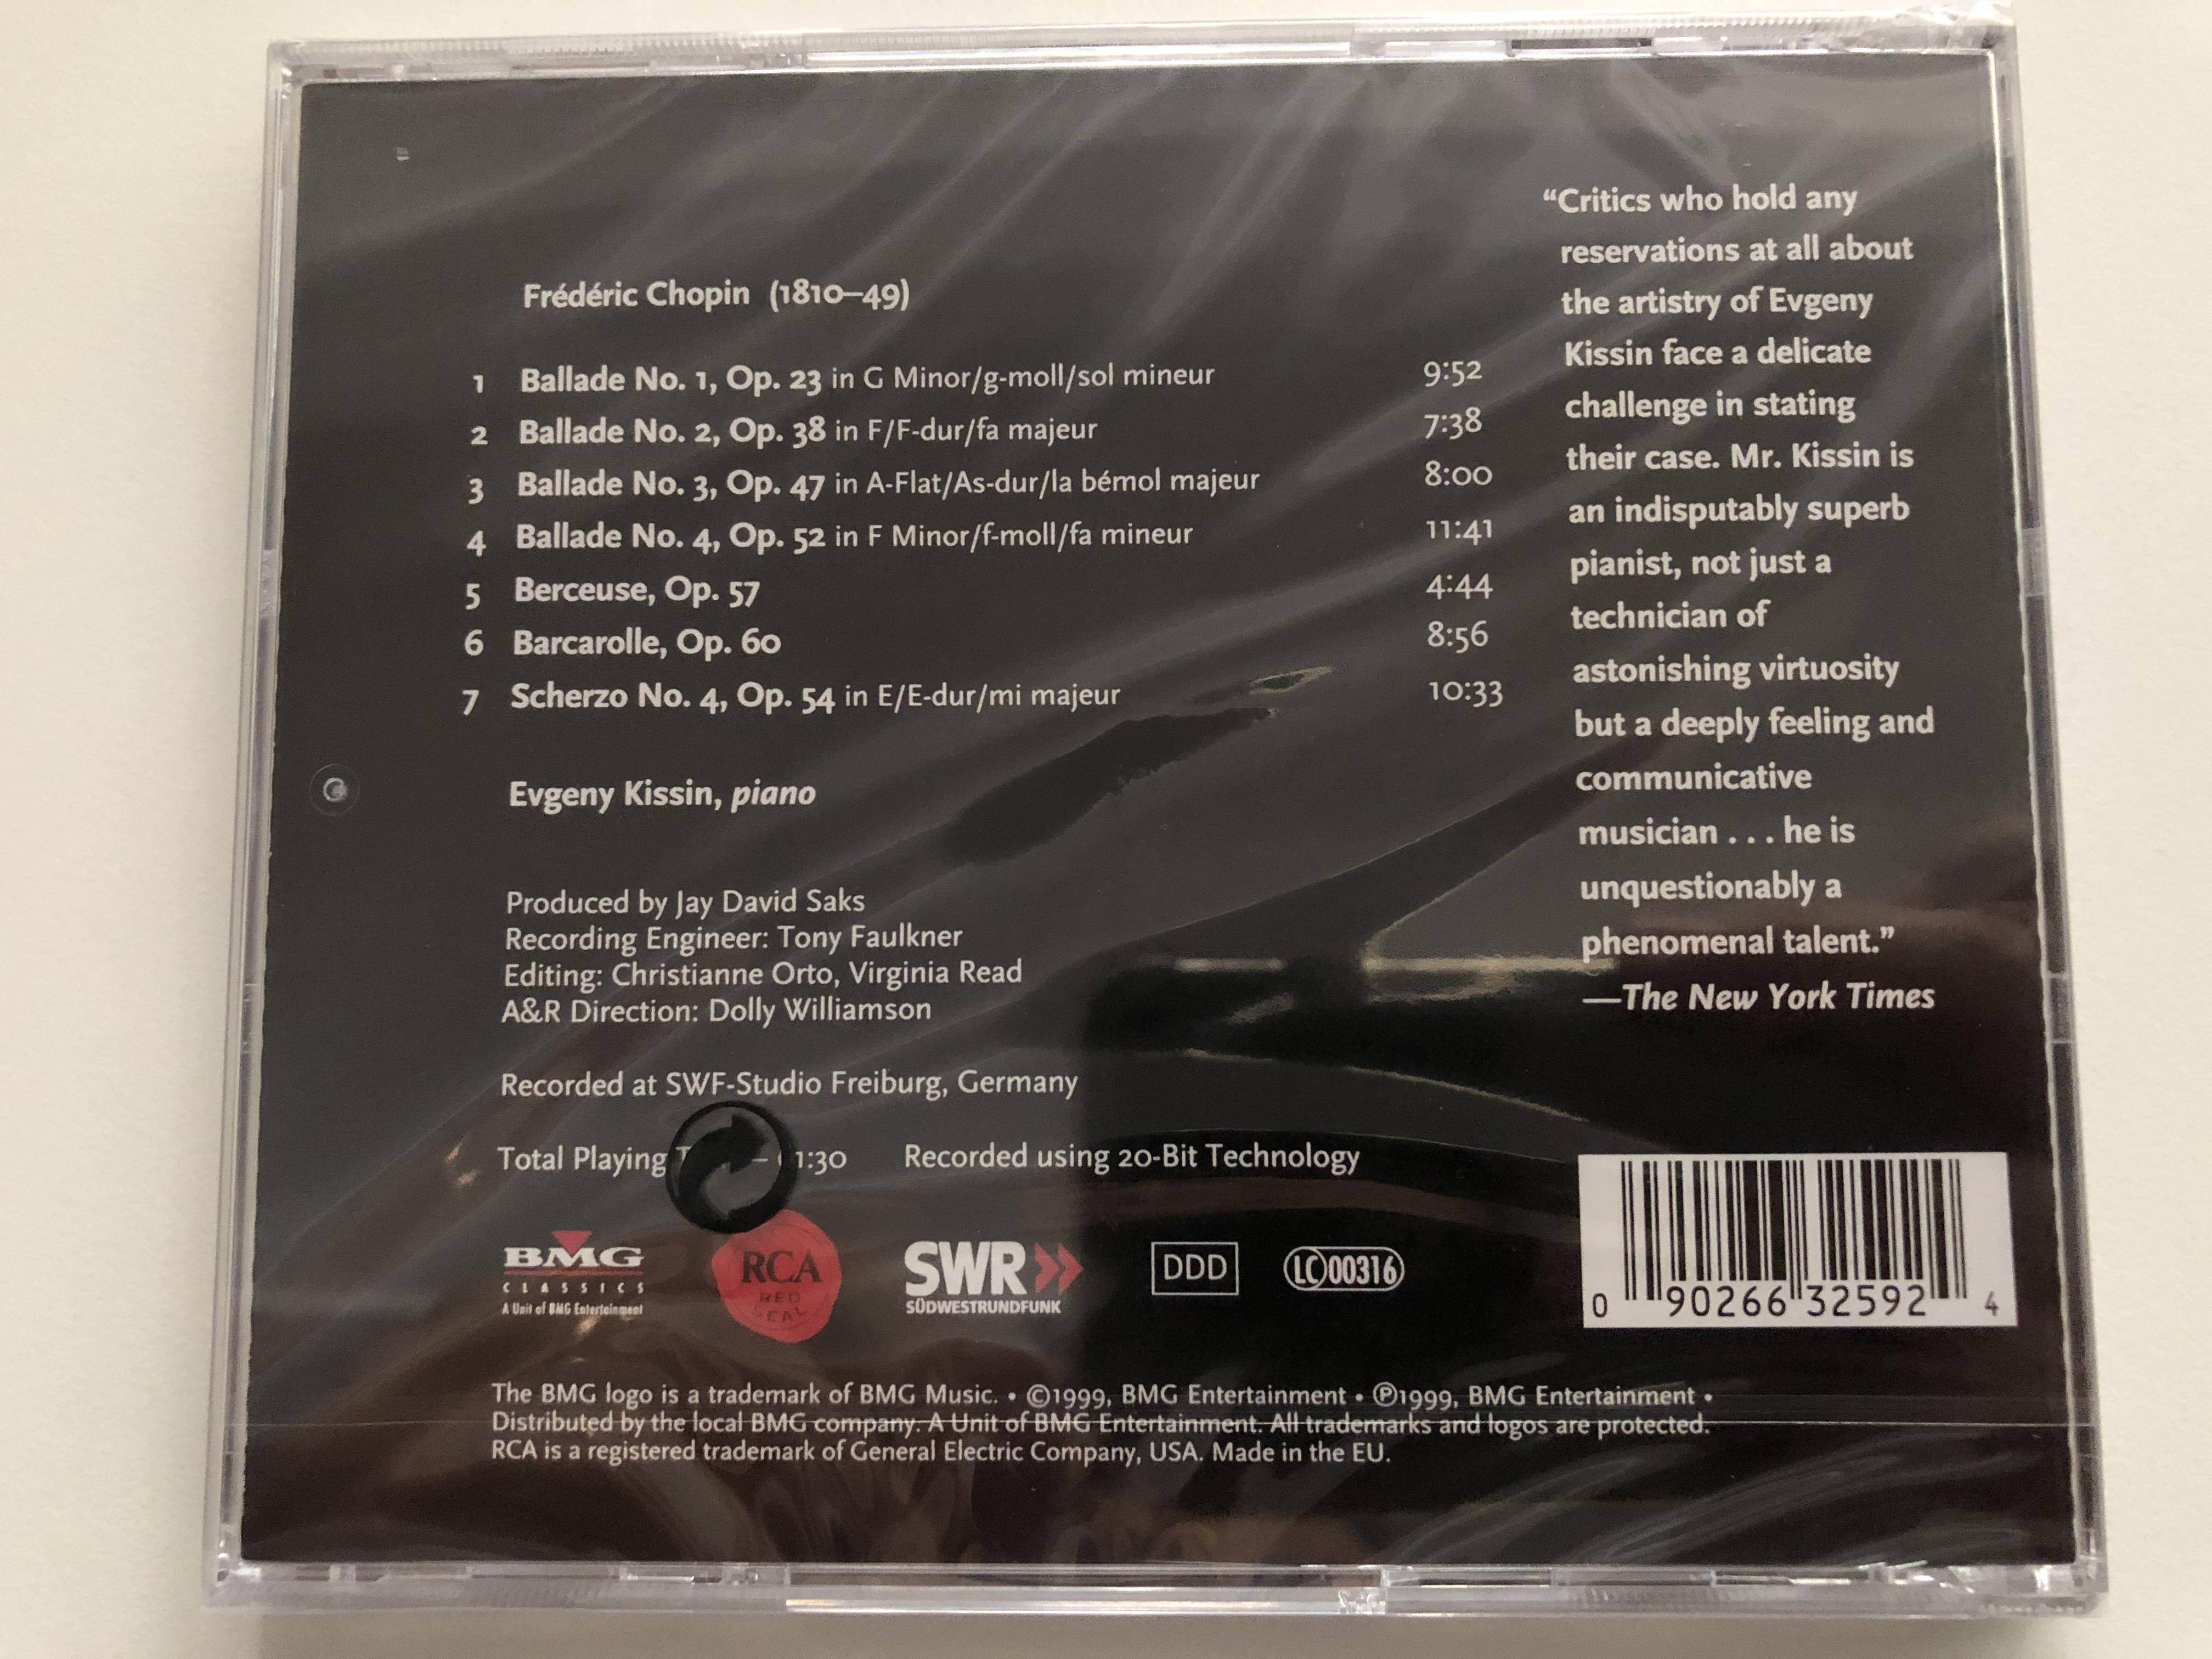 evgeny-kissin-fr-d-ric-chopin-the-four-ballads-berceuse.-op.-57-barcarolle-op.-60-scherzo-no.-4-op.-54-rca-victor-red-seal-audio-cd-1999-09026-63259-2-2-.jpg